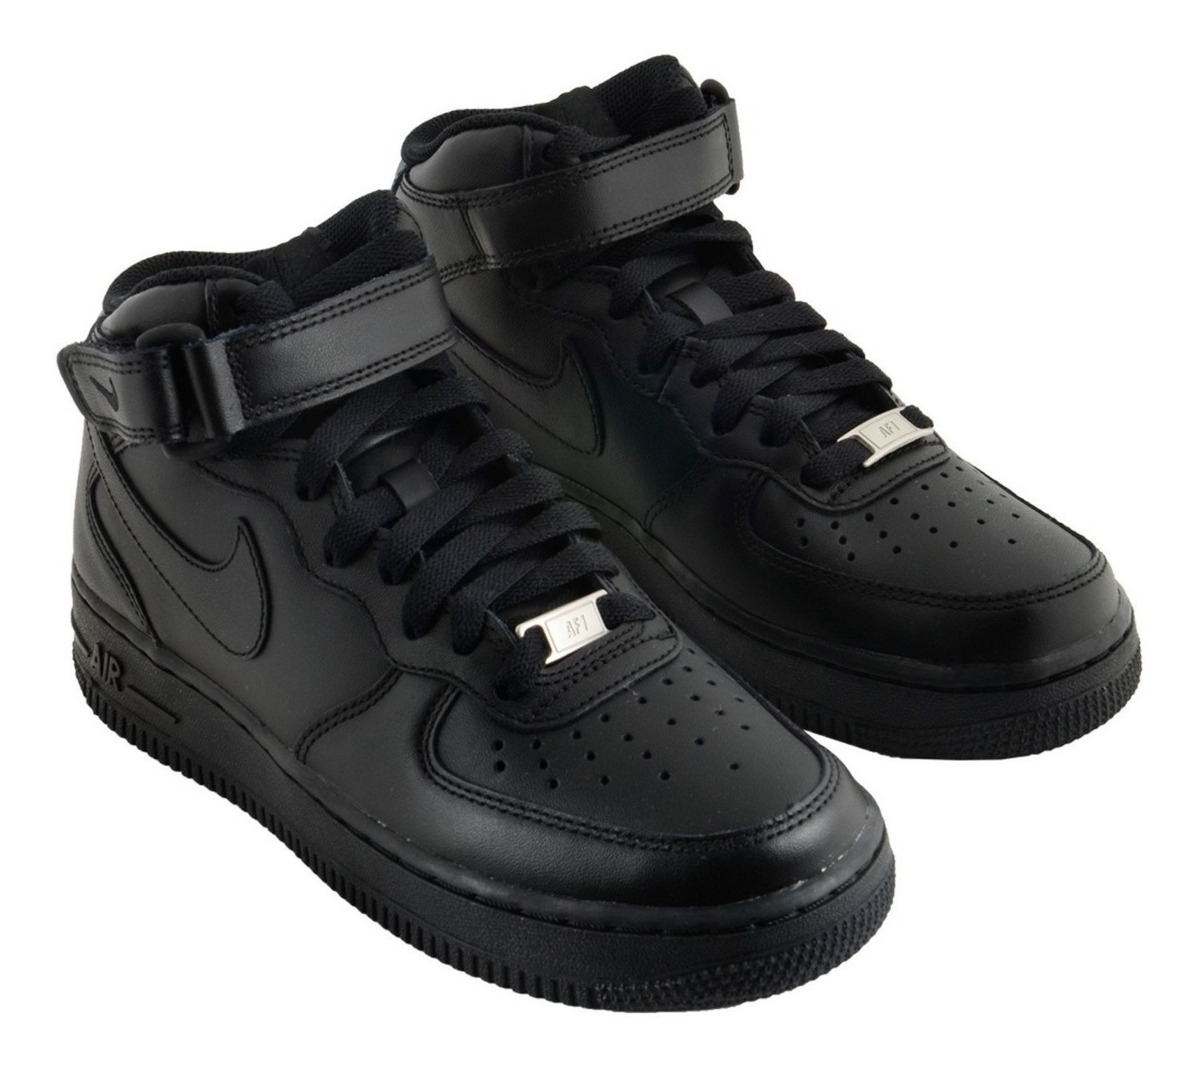 Tênis Nike Air Force 1 Mid Preto Feminino Couro Original!